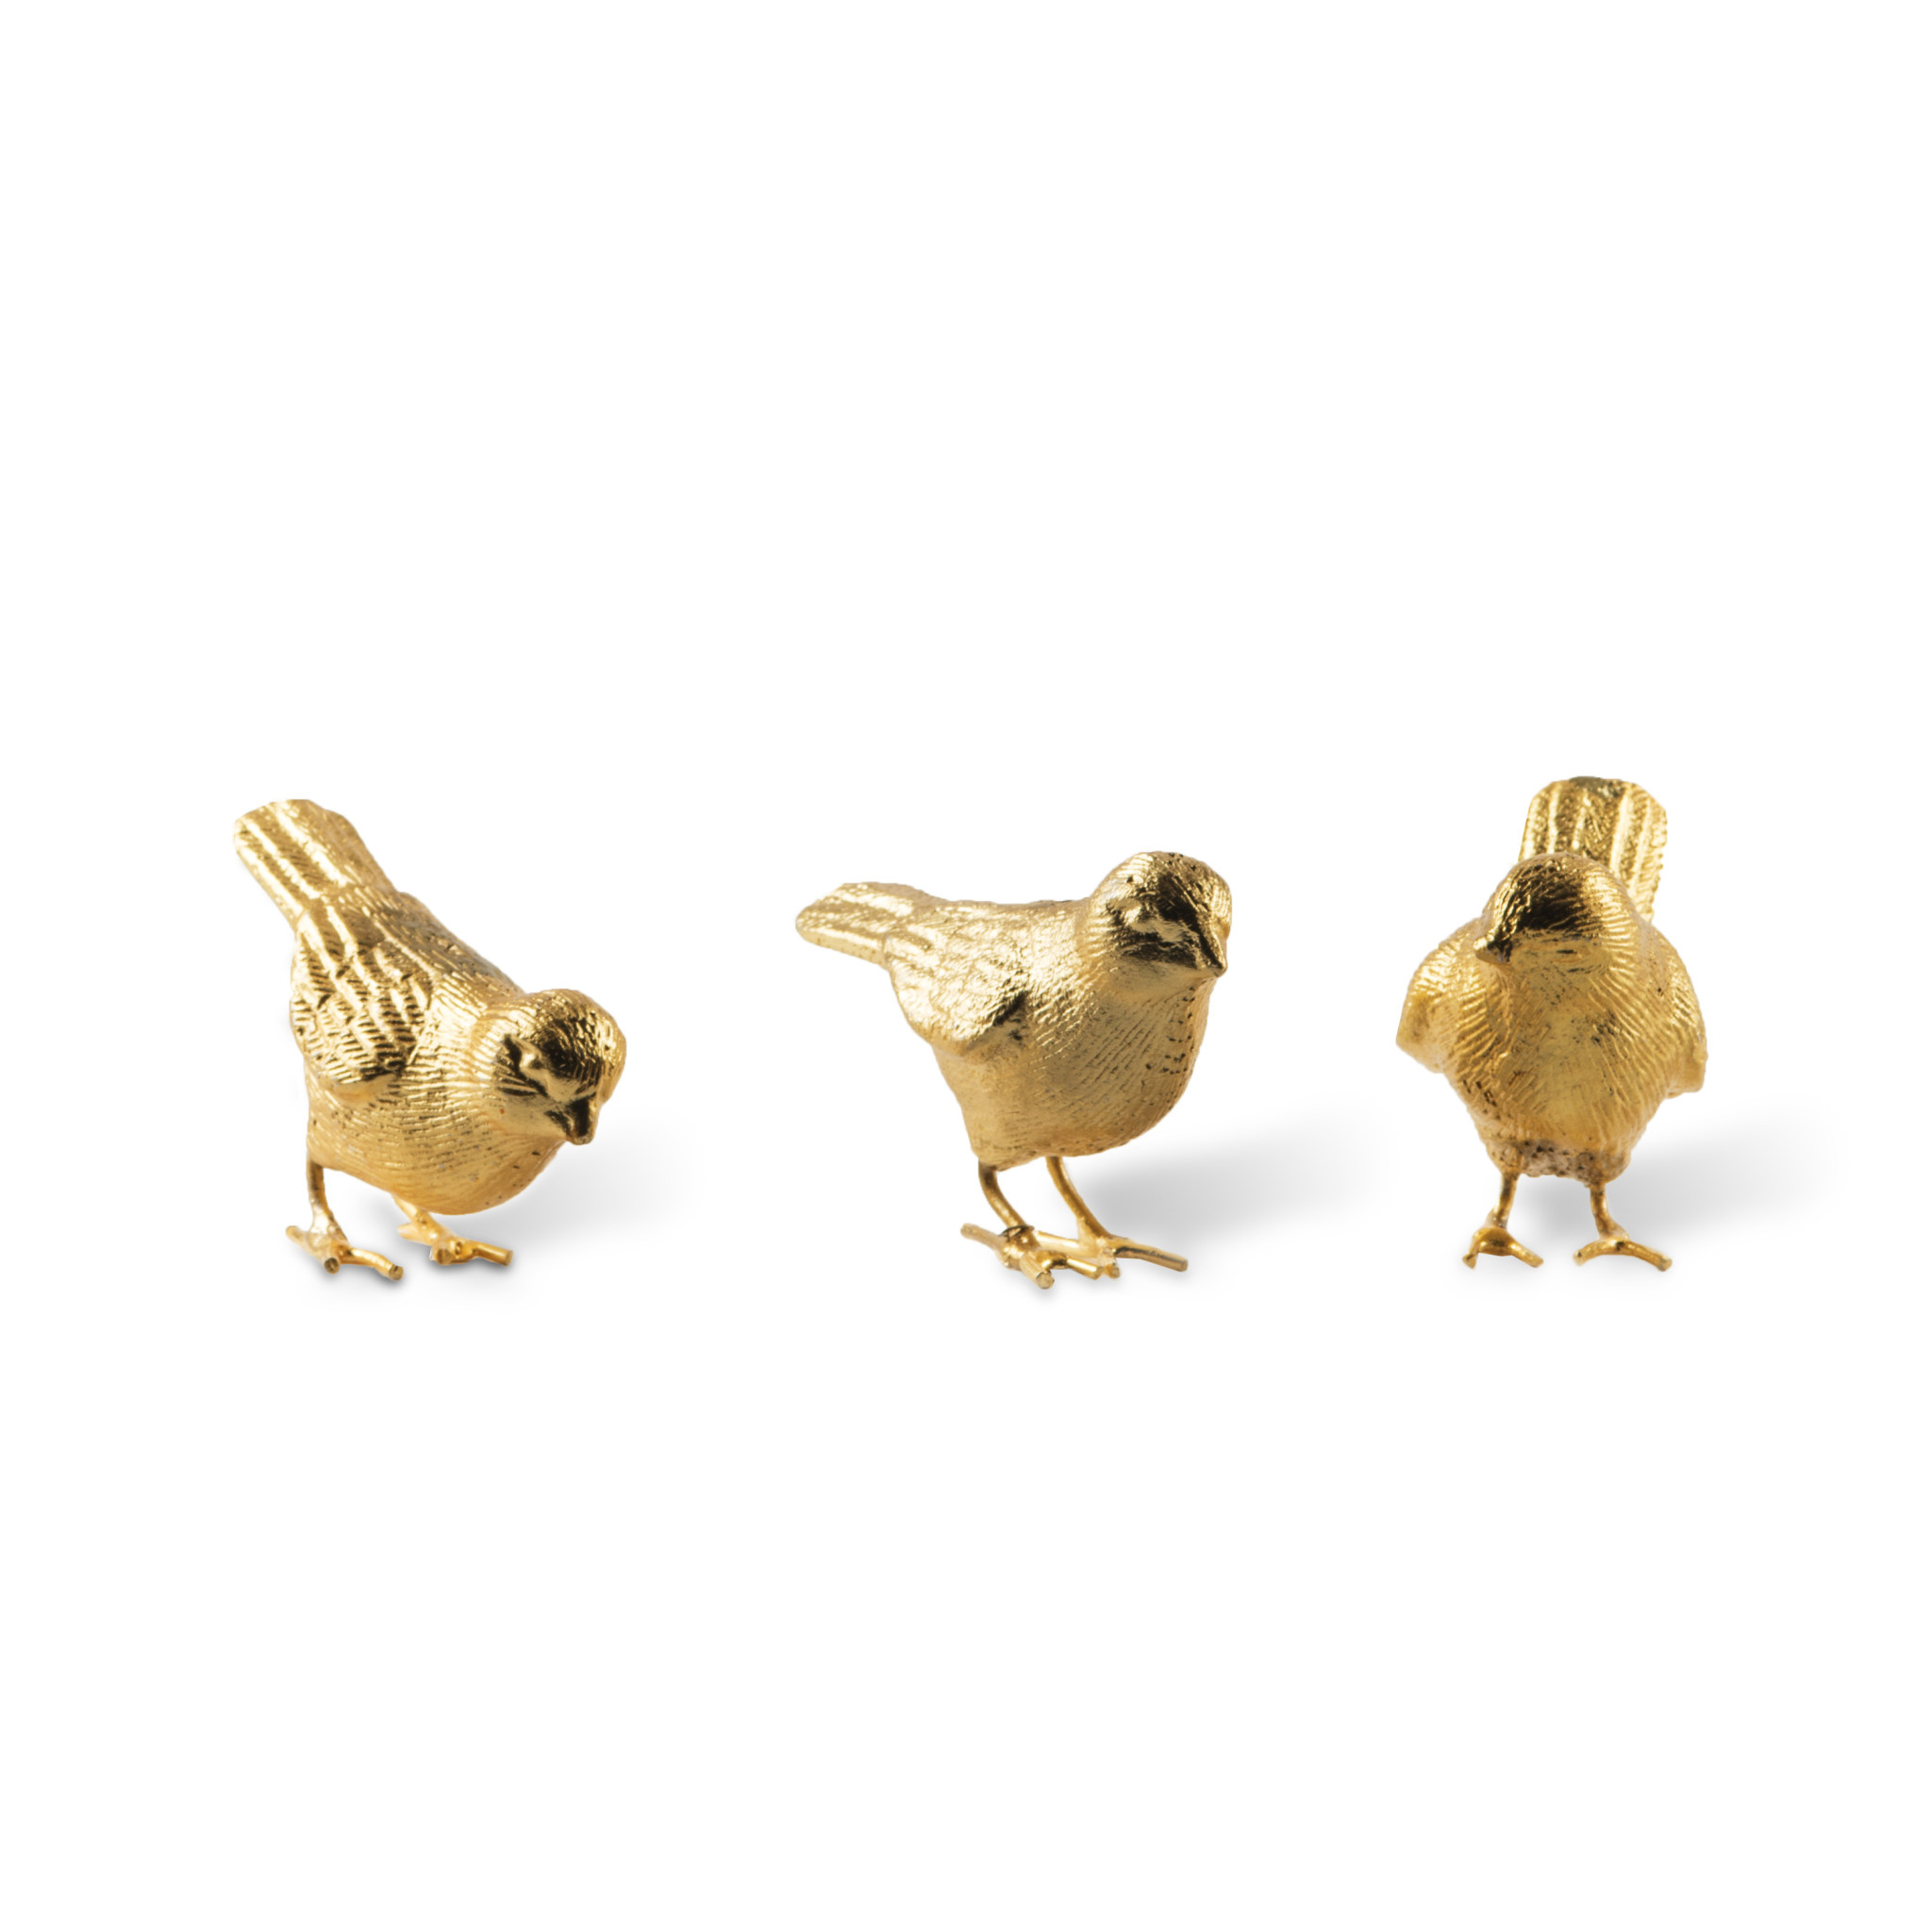 Pols Potten Pols Potten Sparrows Gold Set of 3